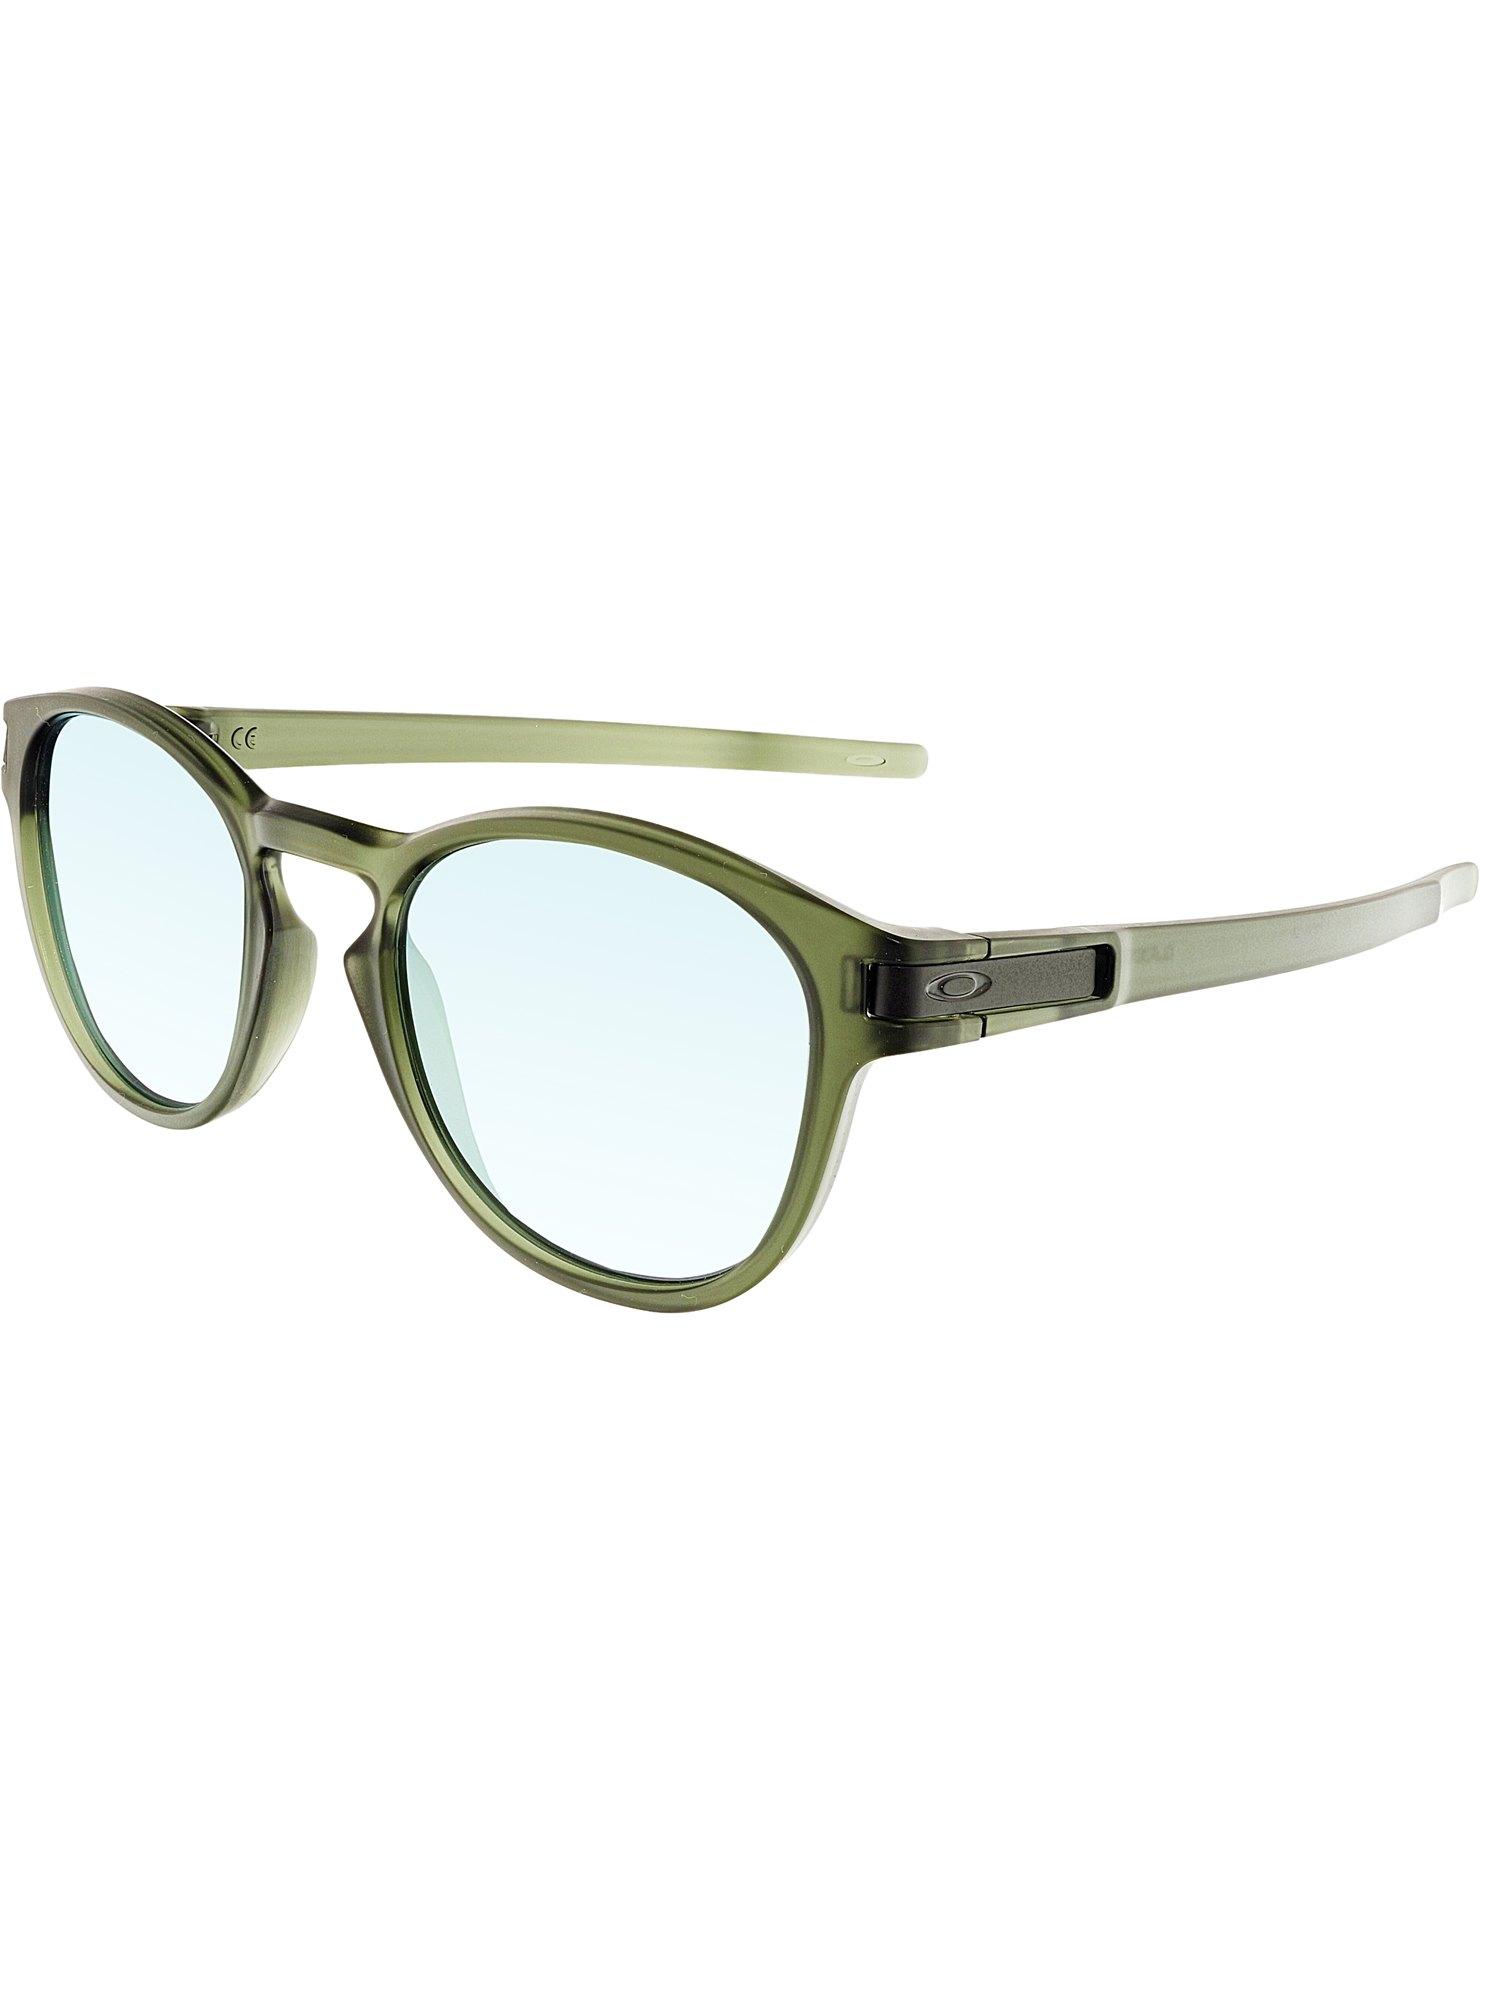 Oakley Latch Sunglasses $63.19 AC + Free Shipping